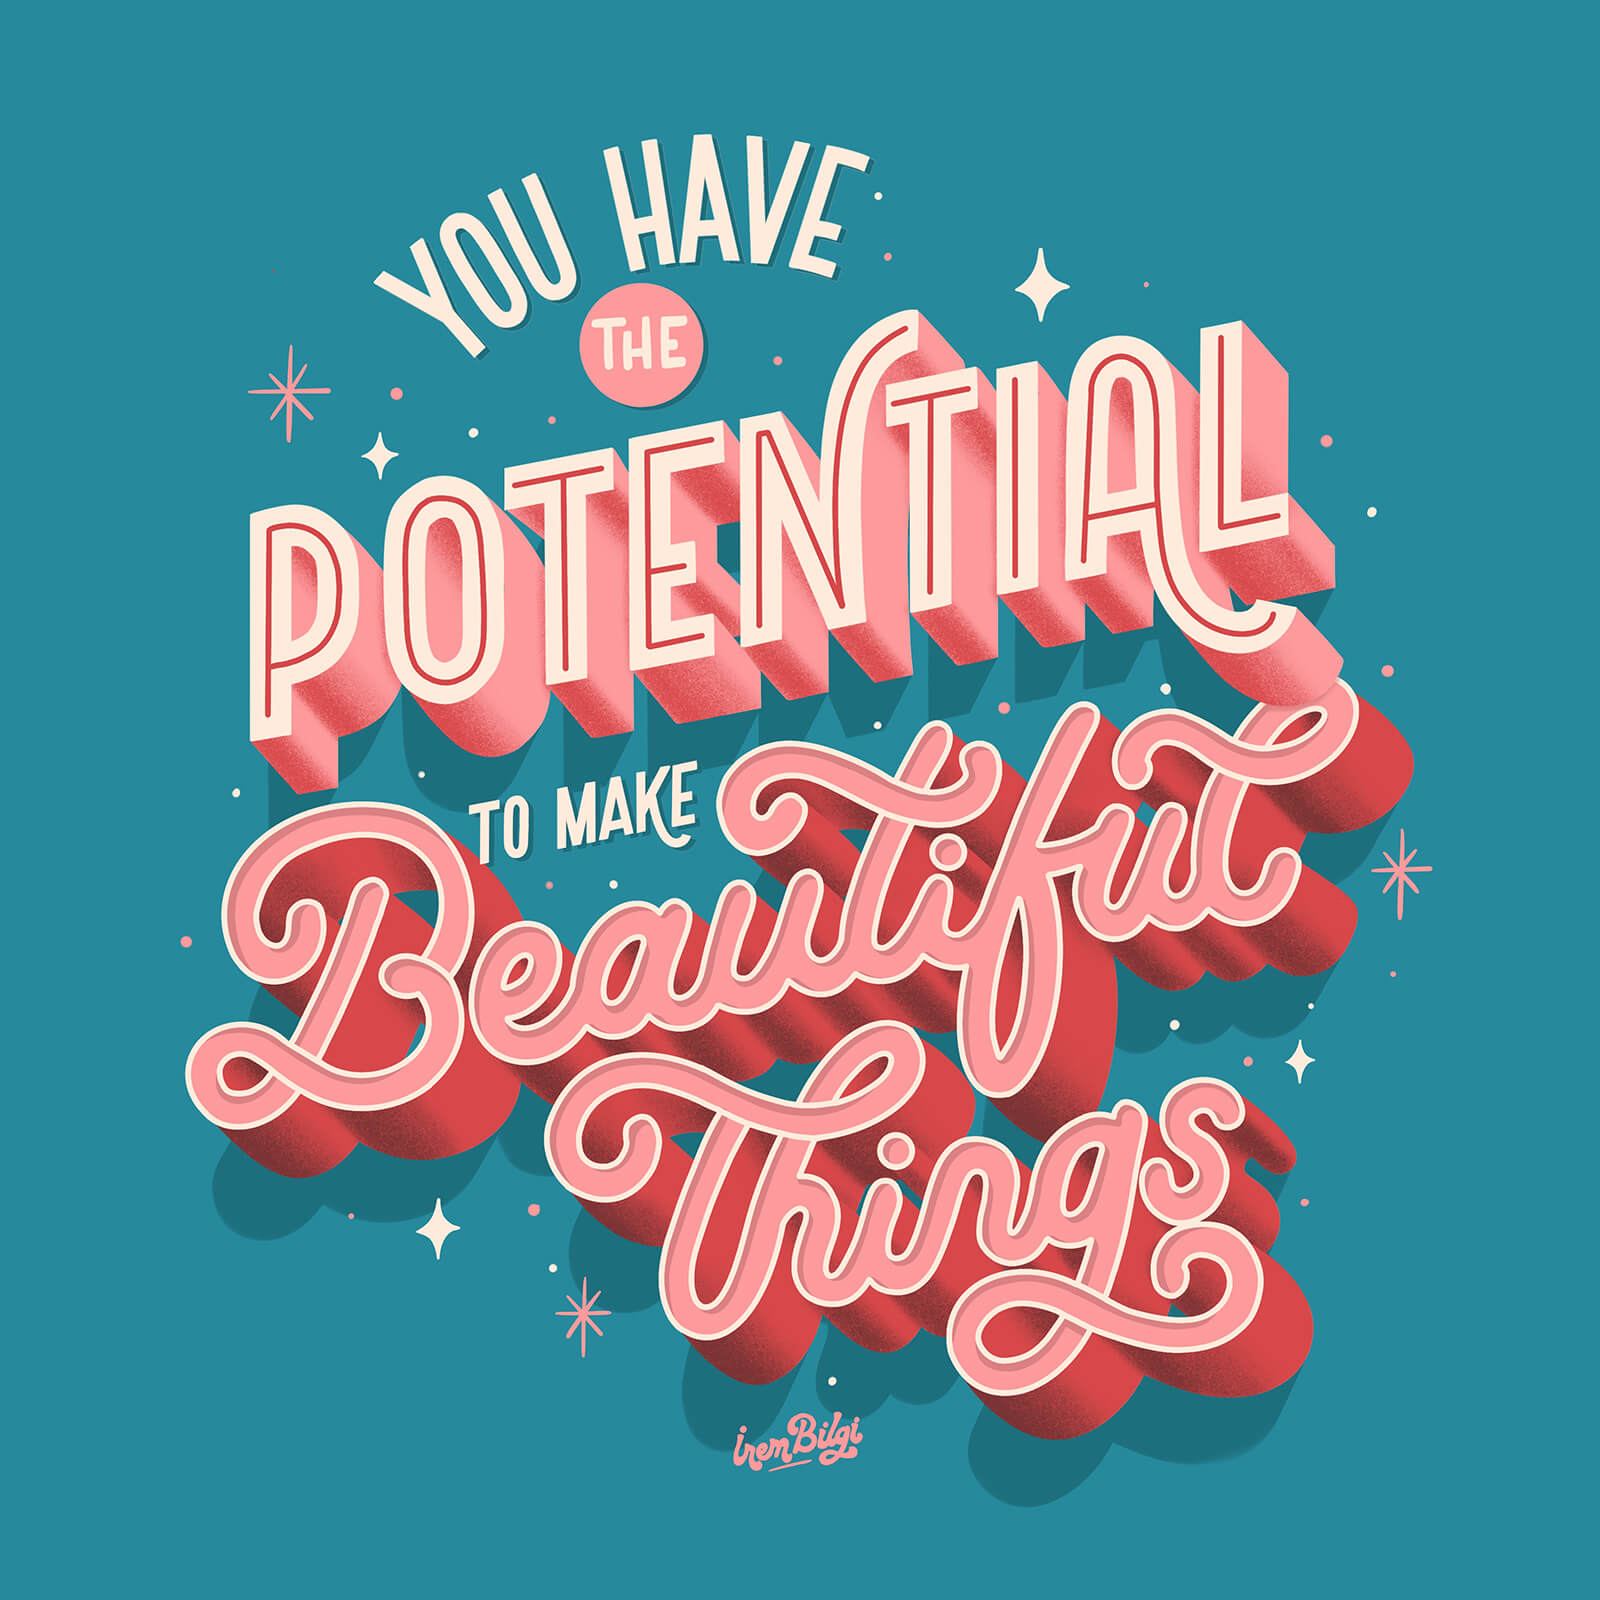 You Have the Potential - İrem Bilgi